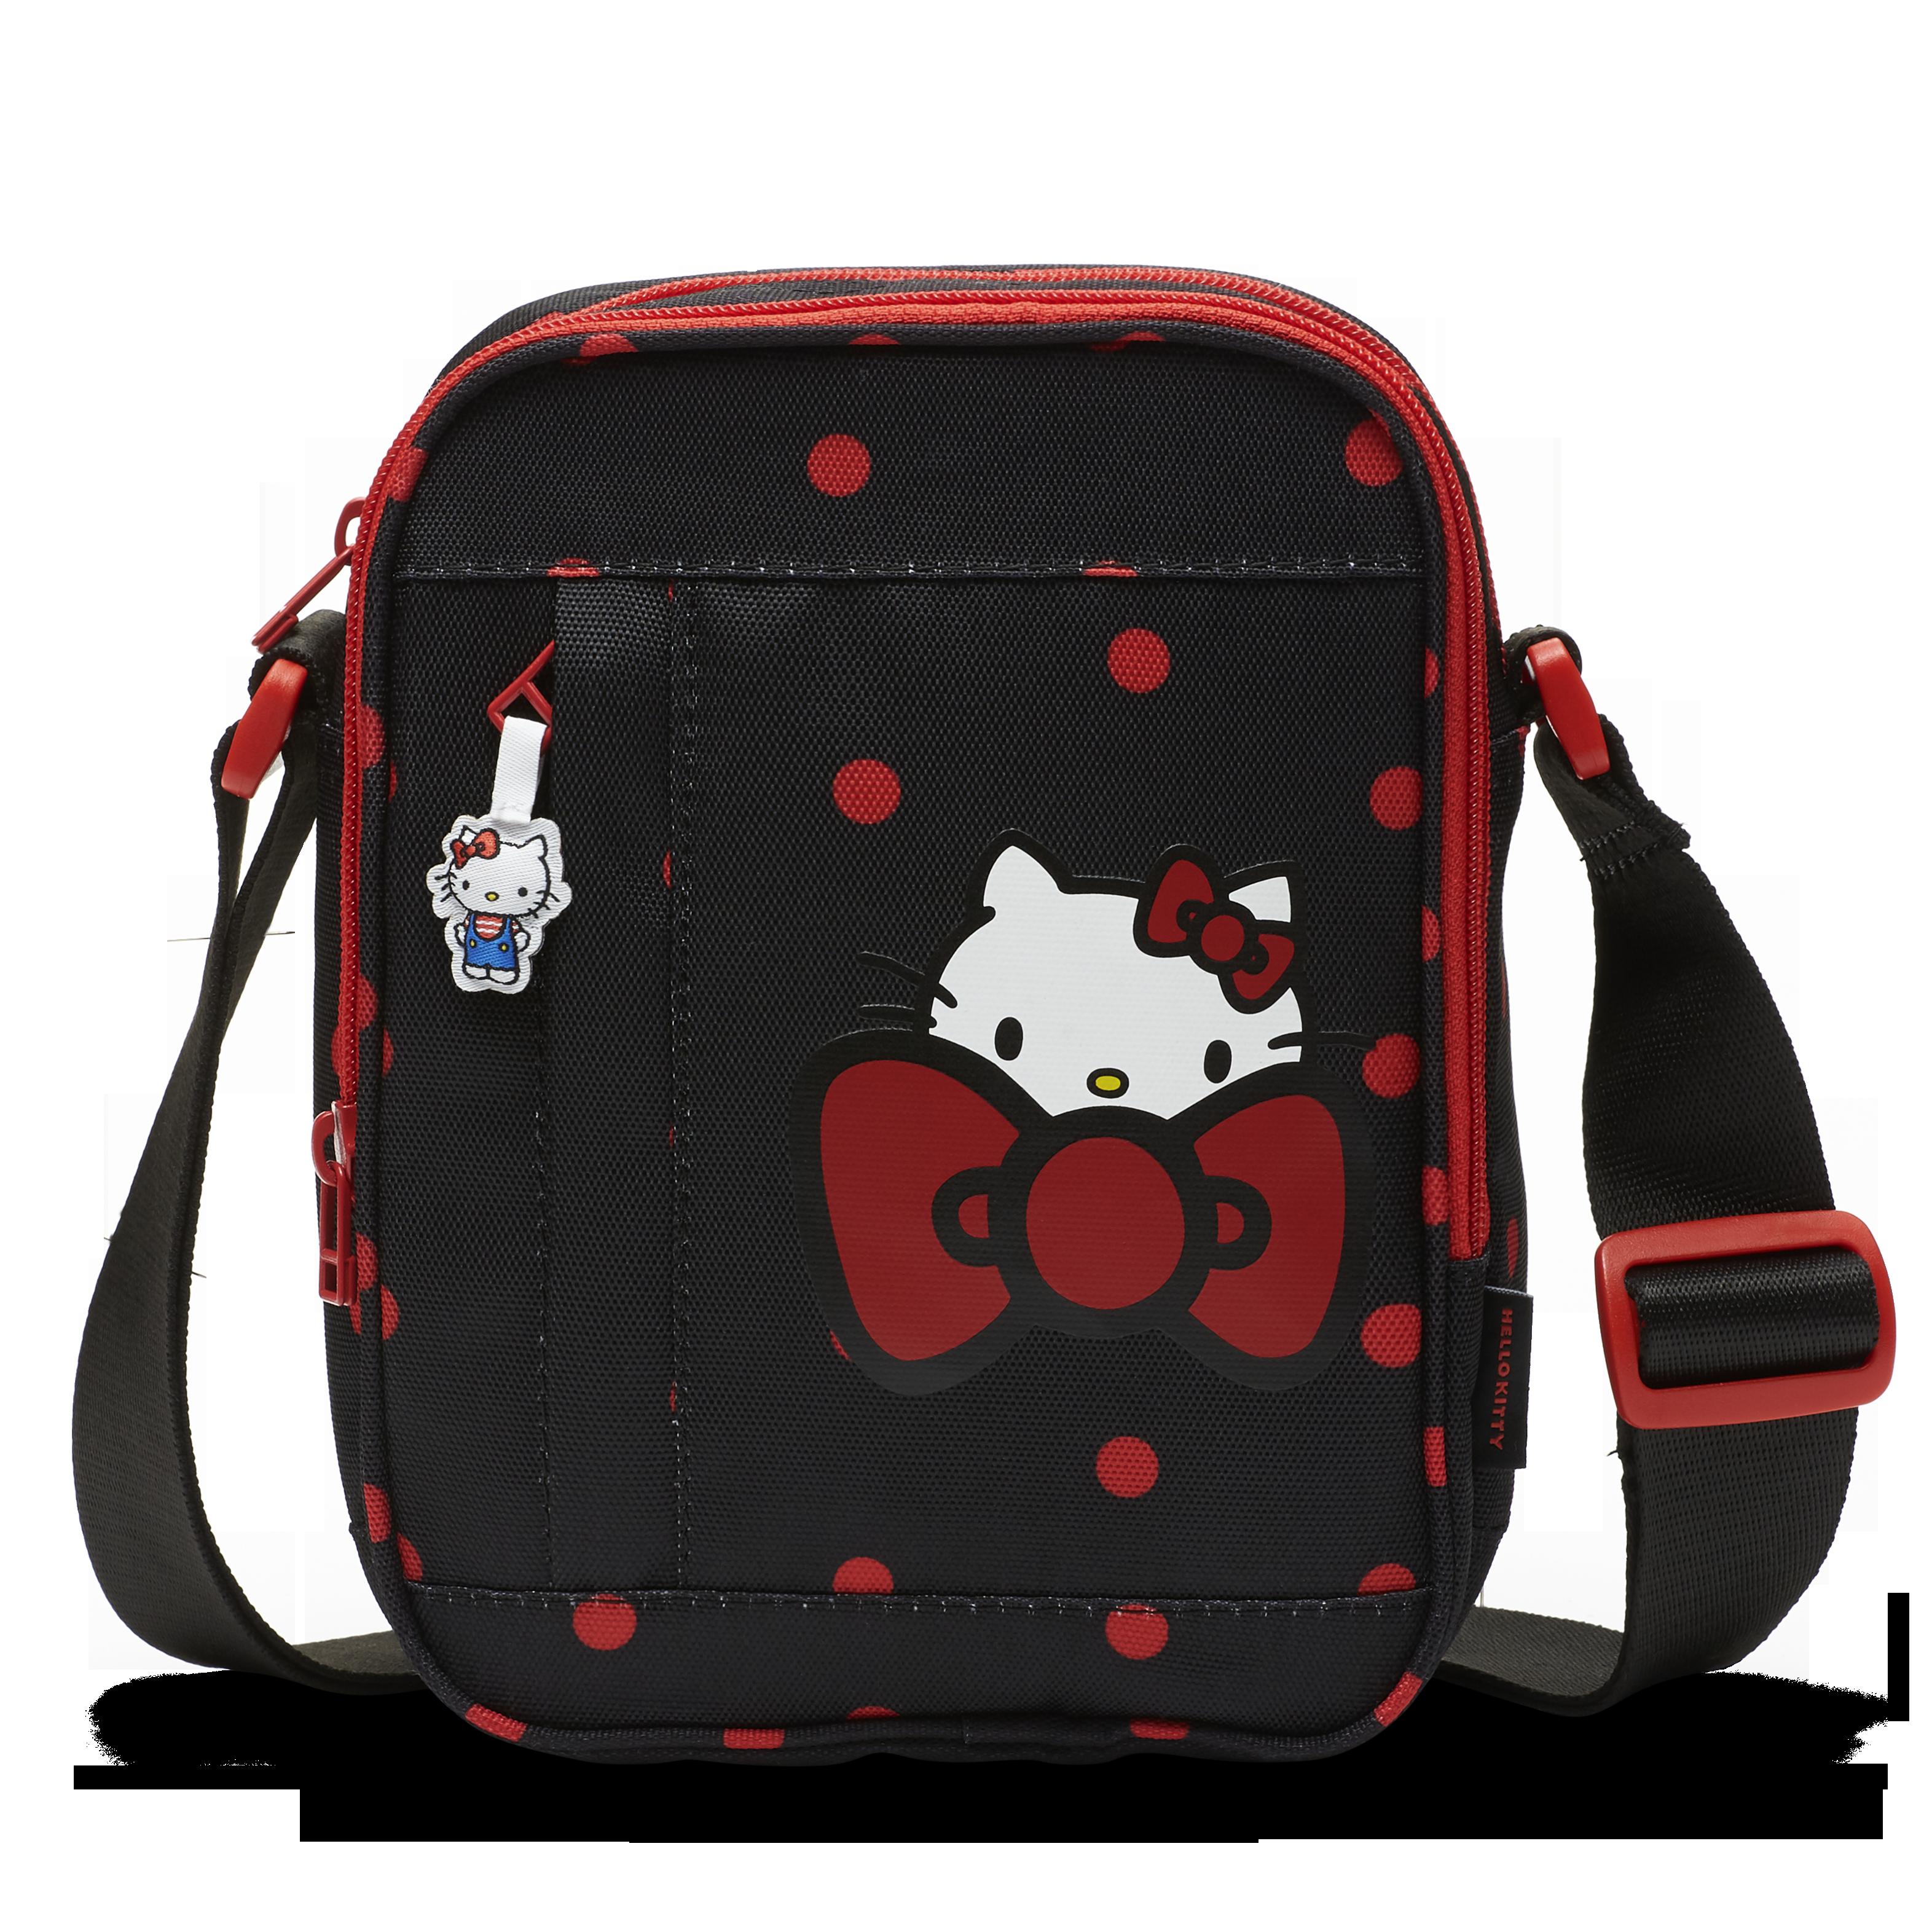 a395a15826 Sanrio x Converse to Release Hello Kitty Sneakers